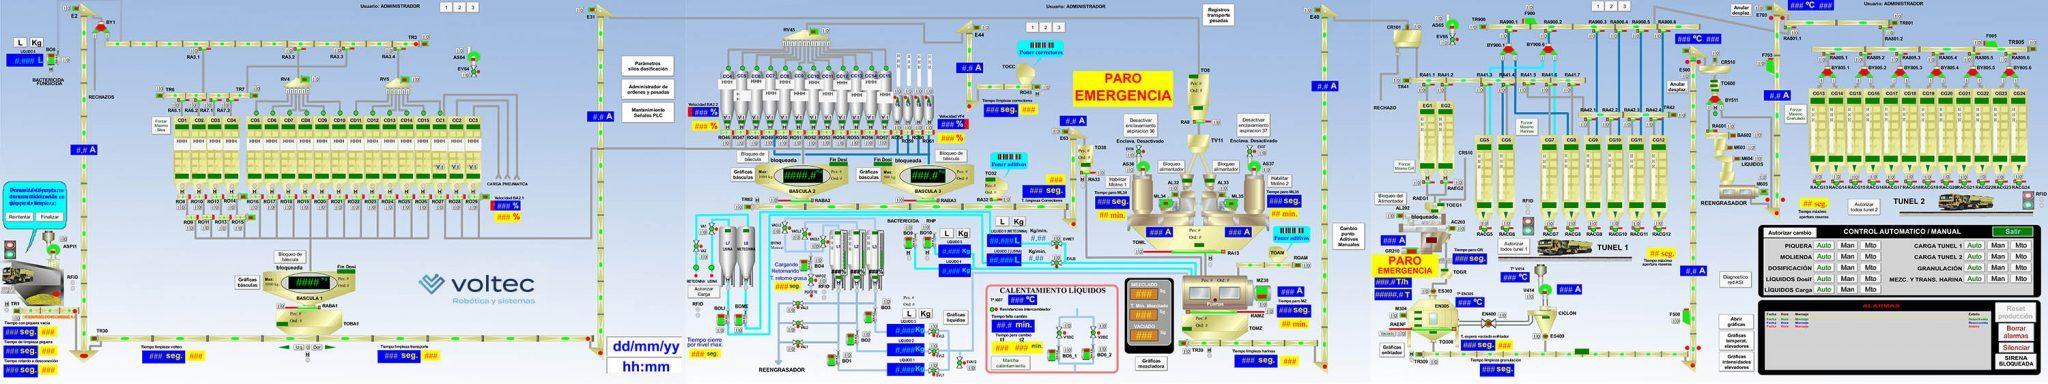 servicio-4-plc-scada-2